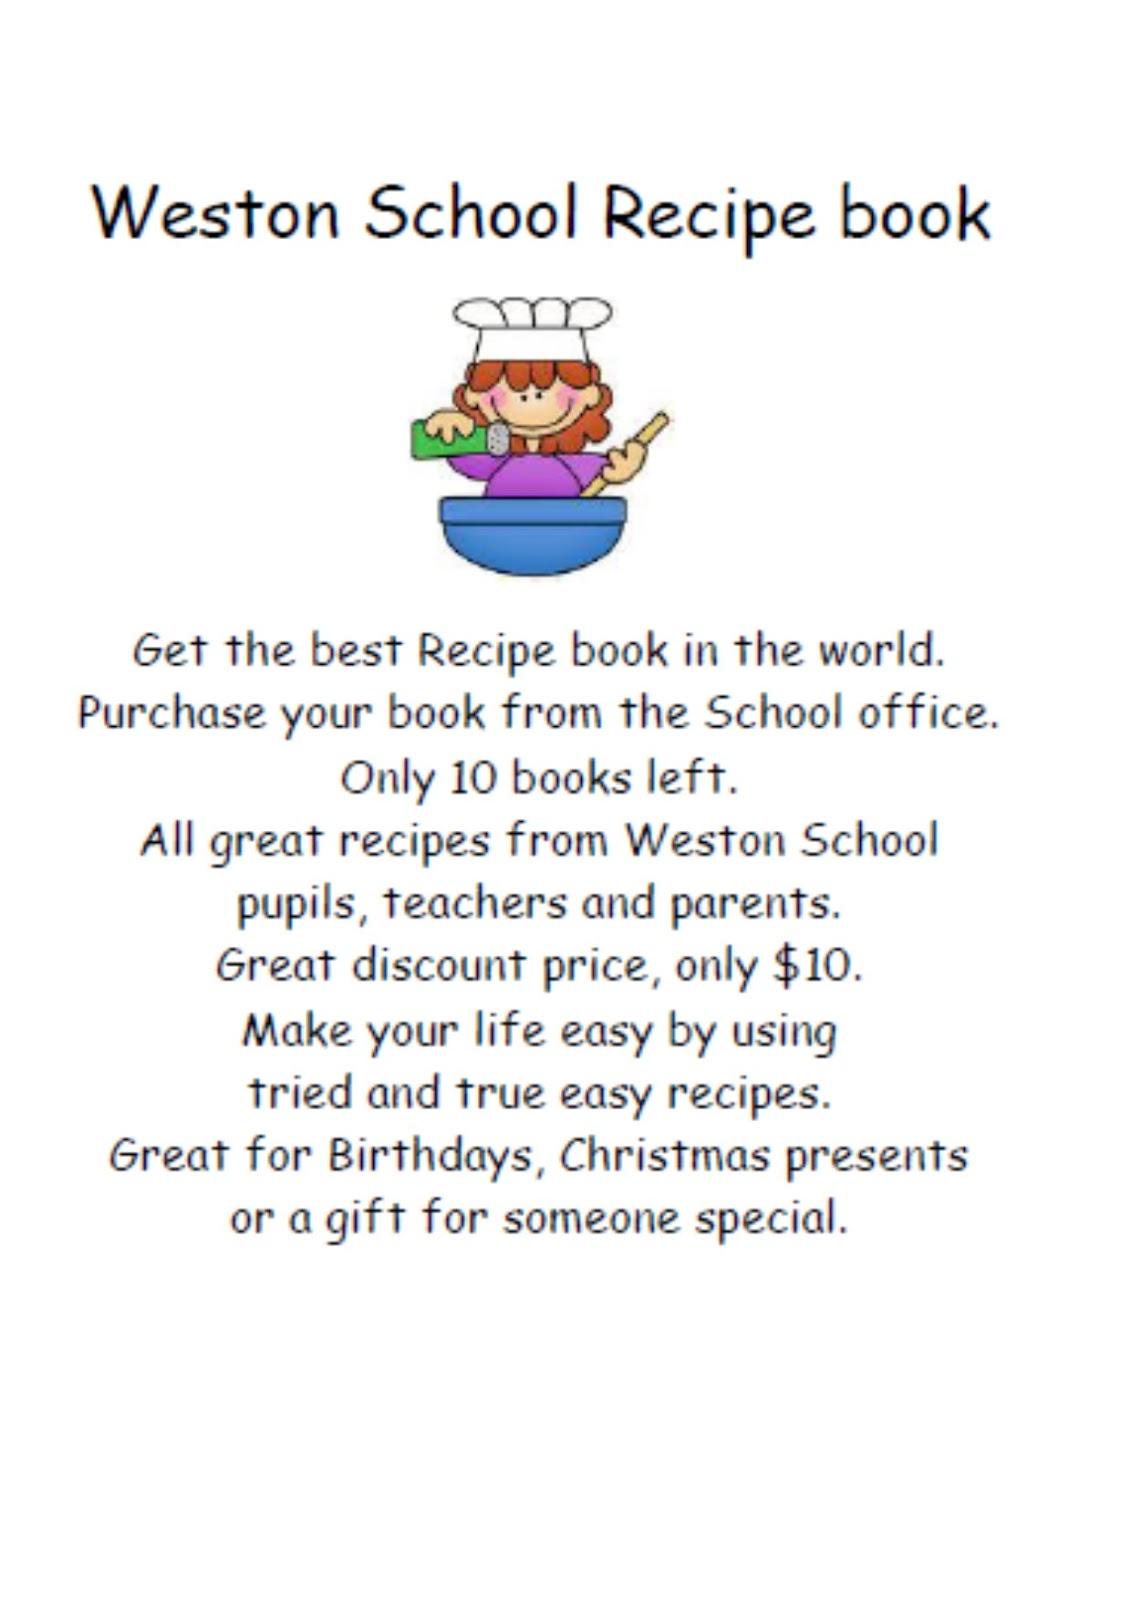 Weston School Recipe book.jpg